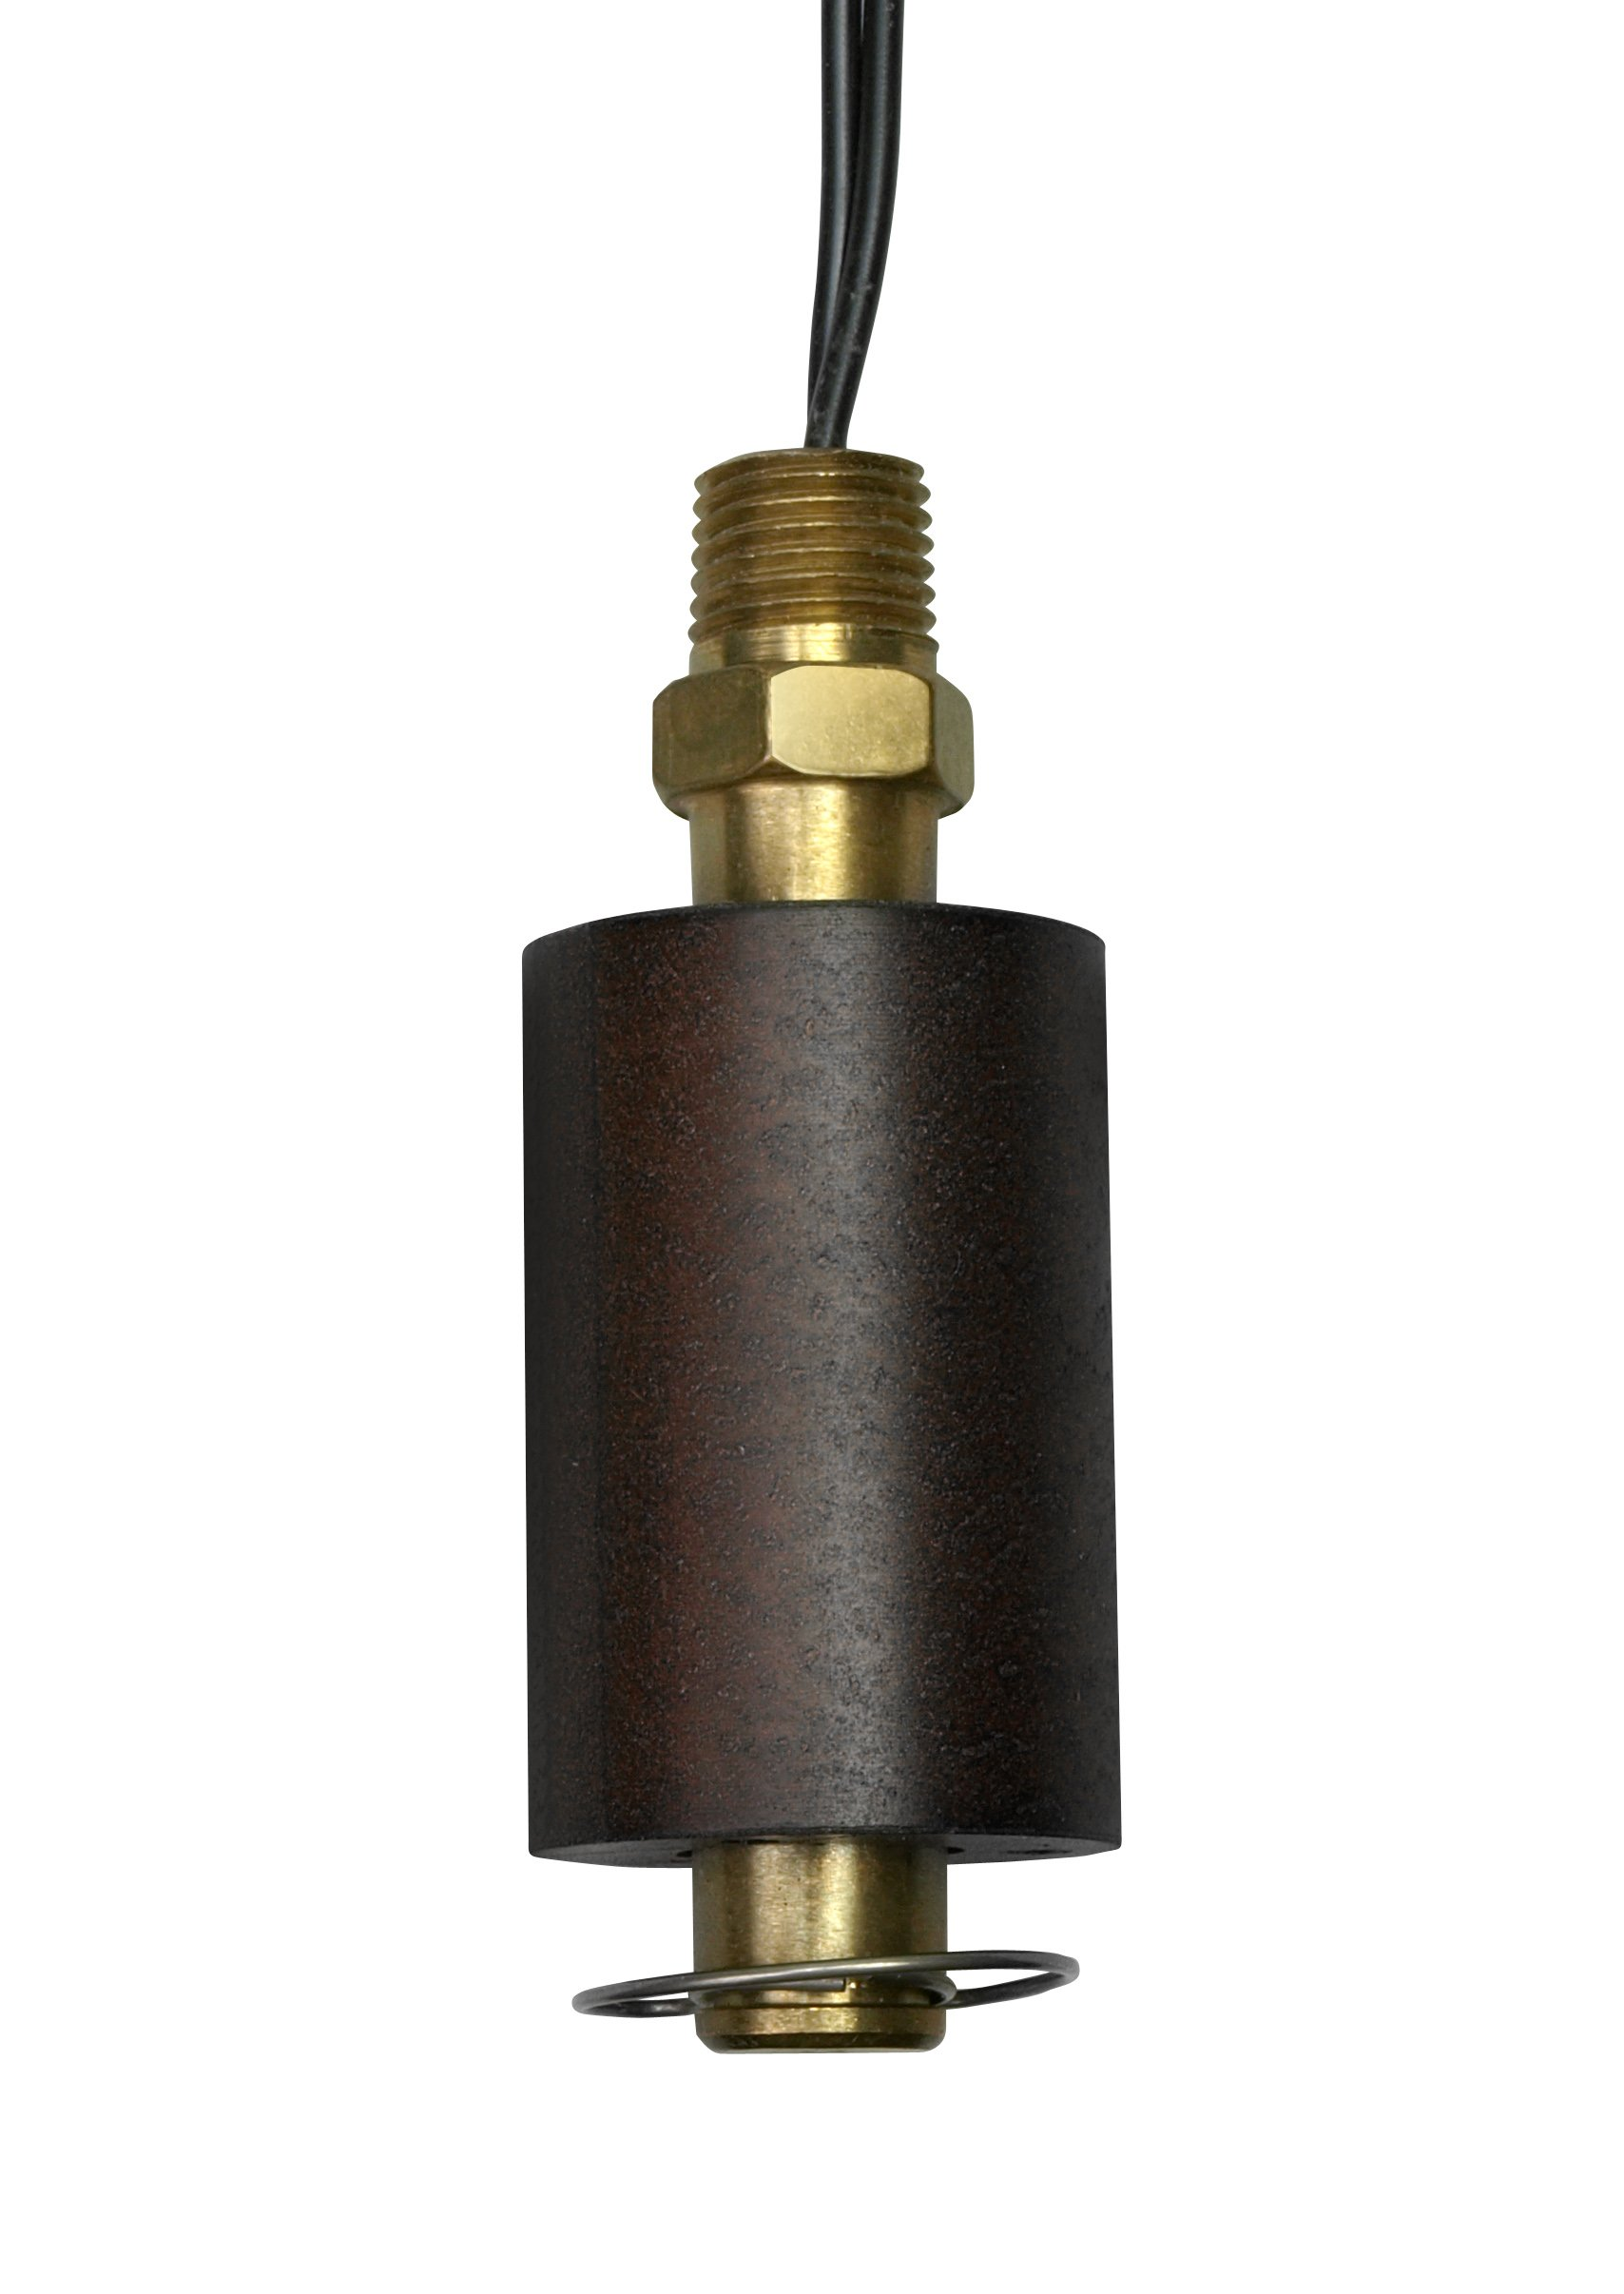 Madison M4300 Brass Full Size Liquid Level Switch with Stem, 60 VA SPST, 1/4'' NPT Male, 150 psig Pressure